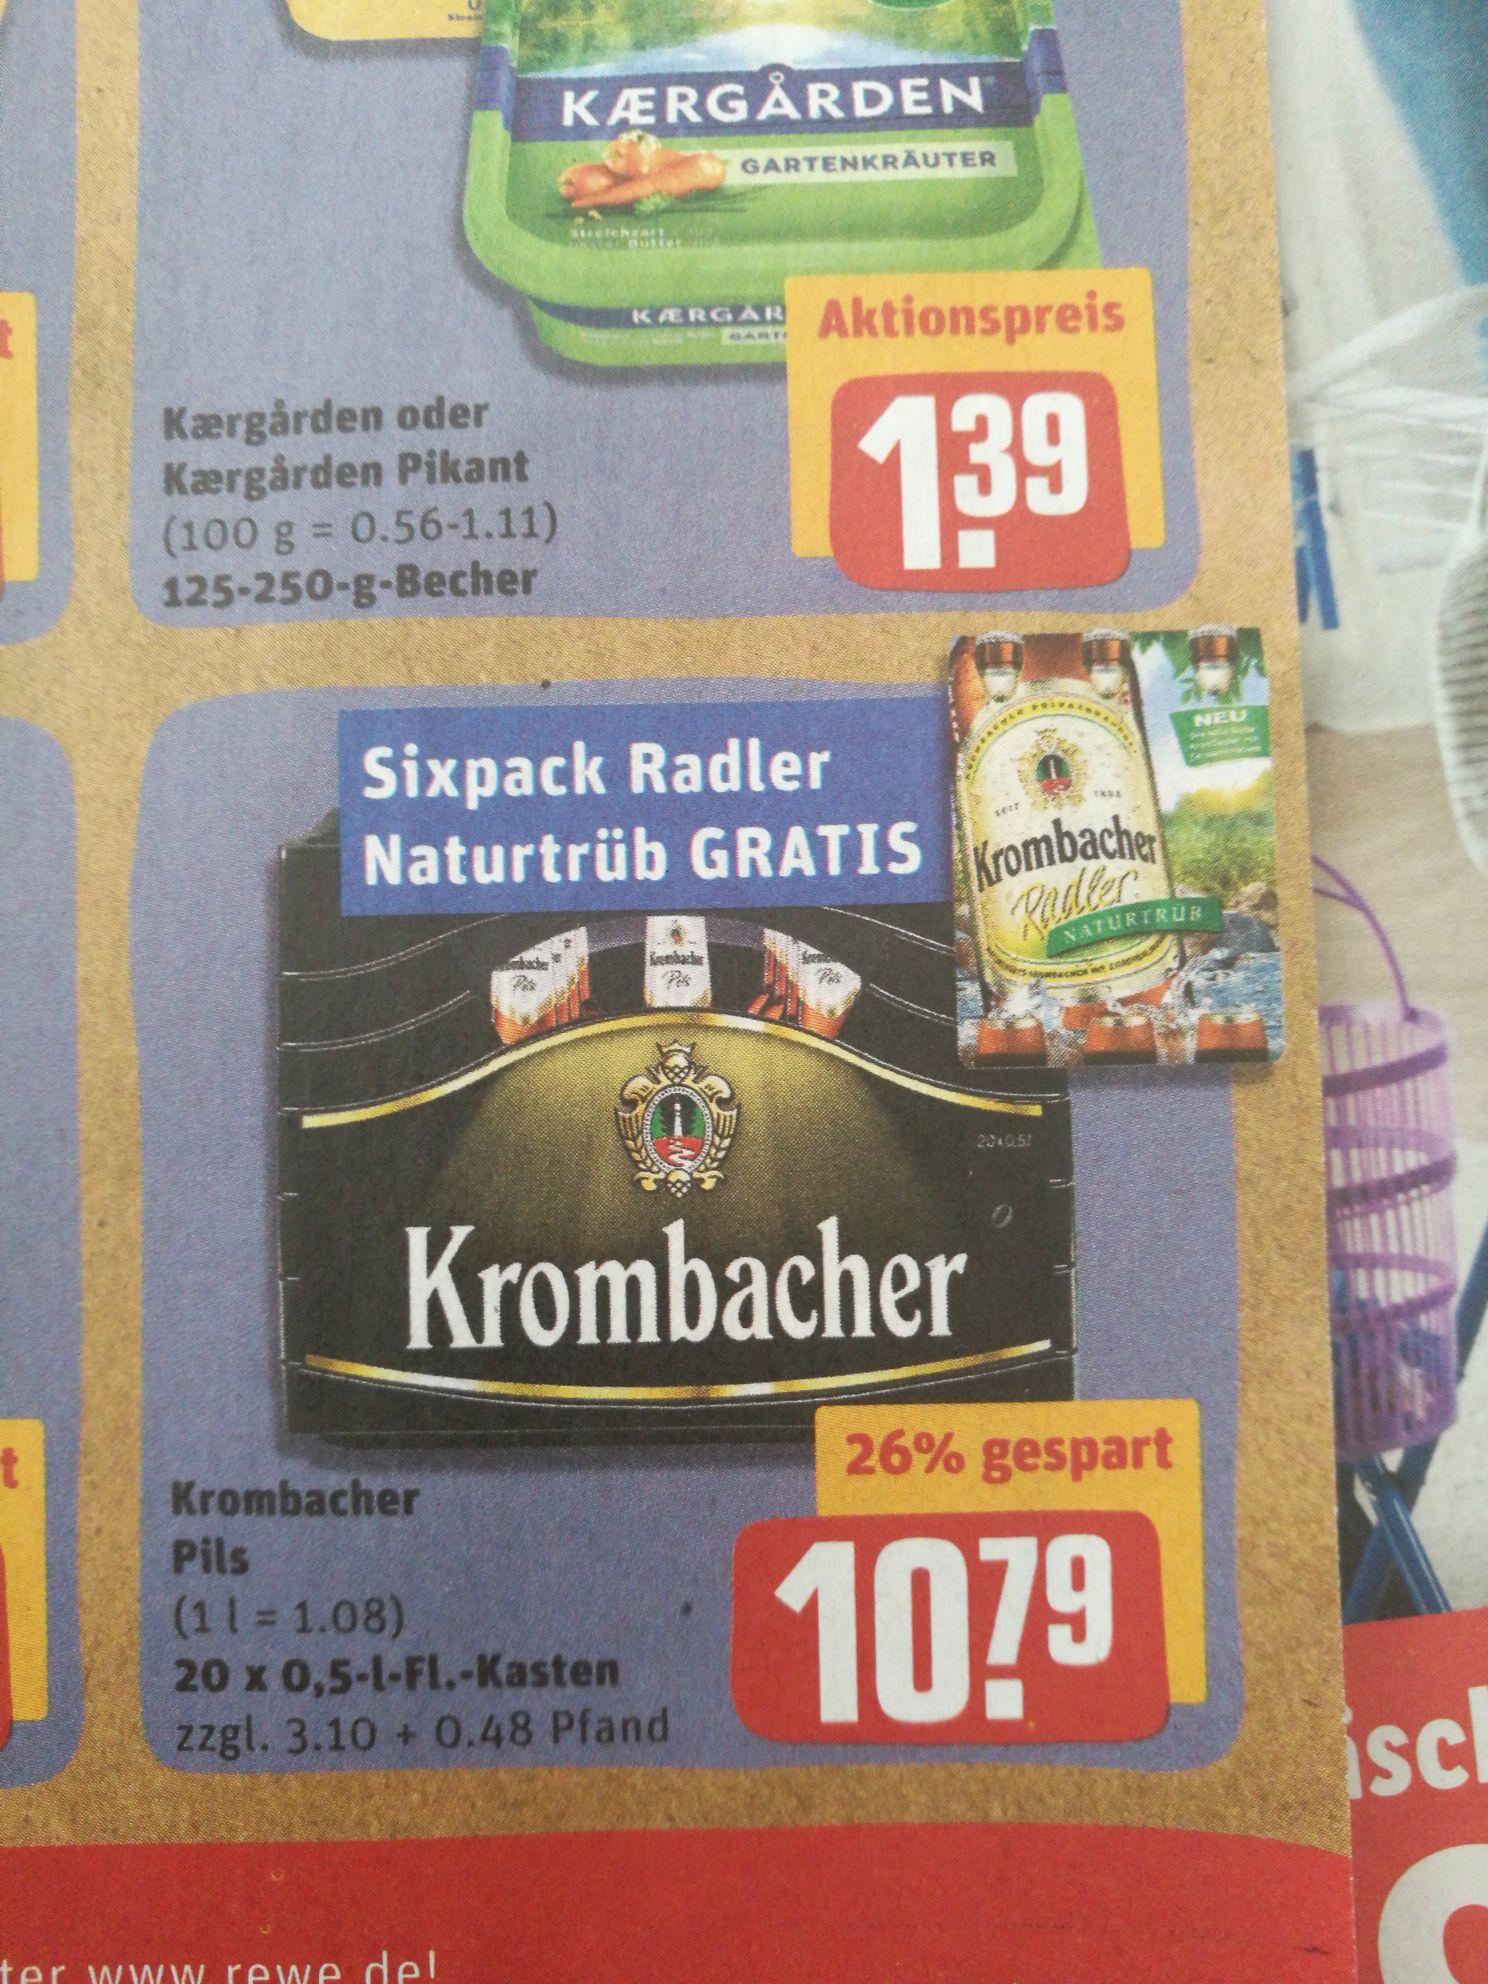 [Rewe offline] Krombacher 20x0,5 Liter plus Sixpack Radler Naturtrüb